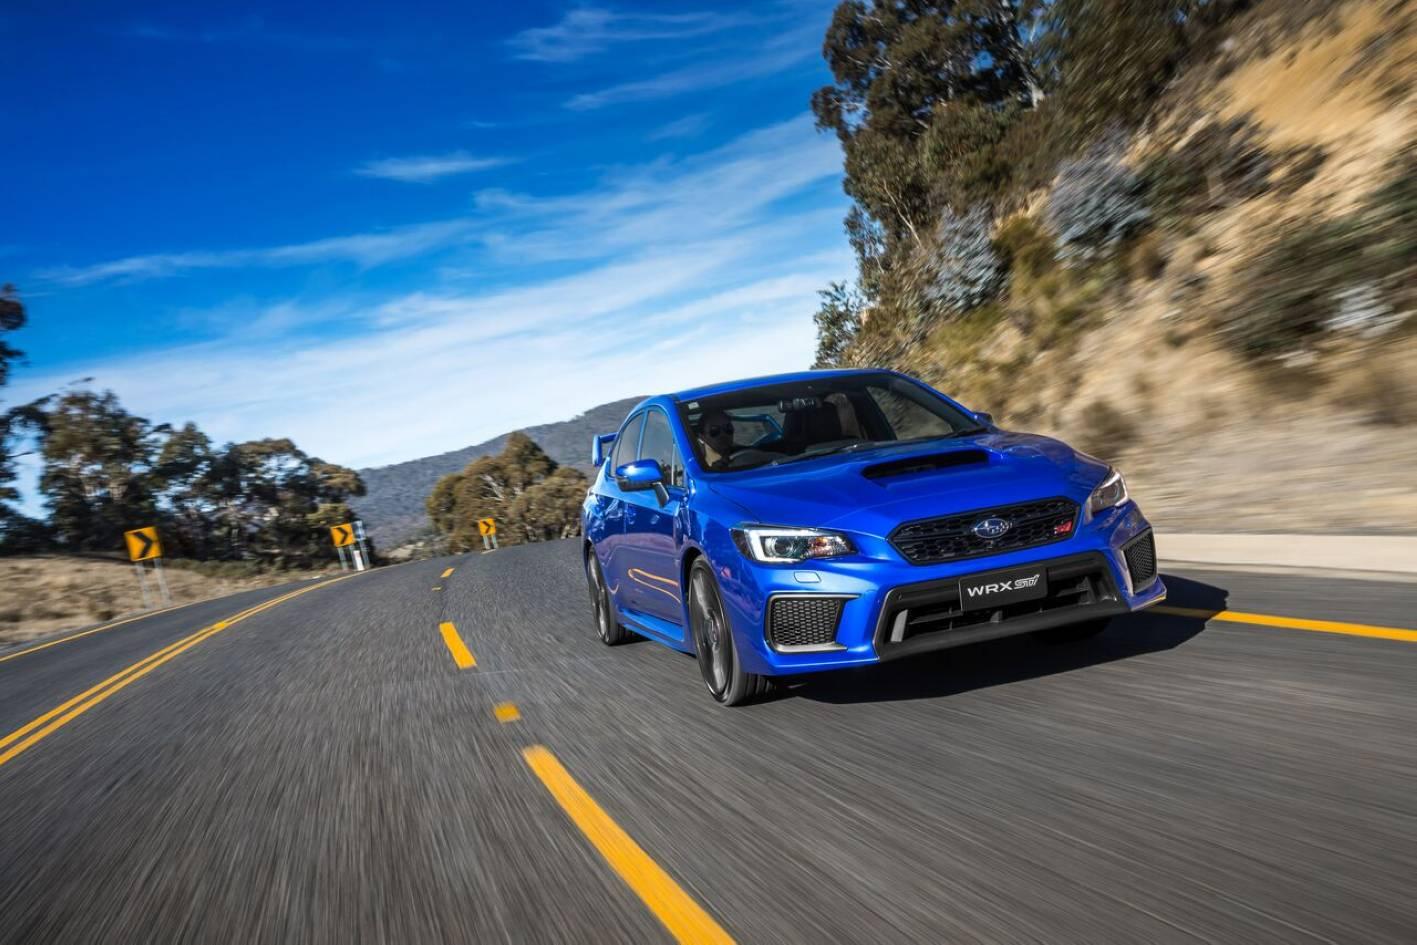 Subaru WRX STI review & buyer's guide — Auto Expert by John